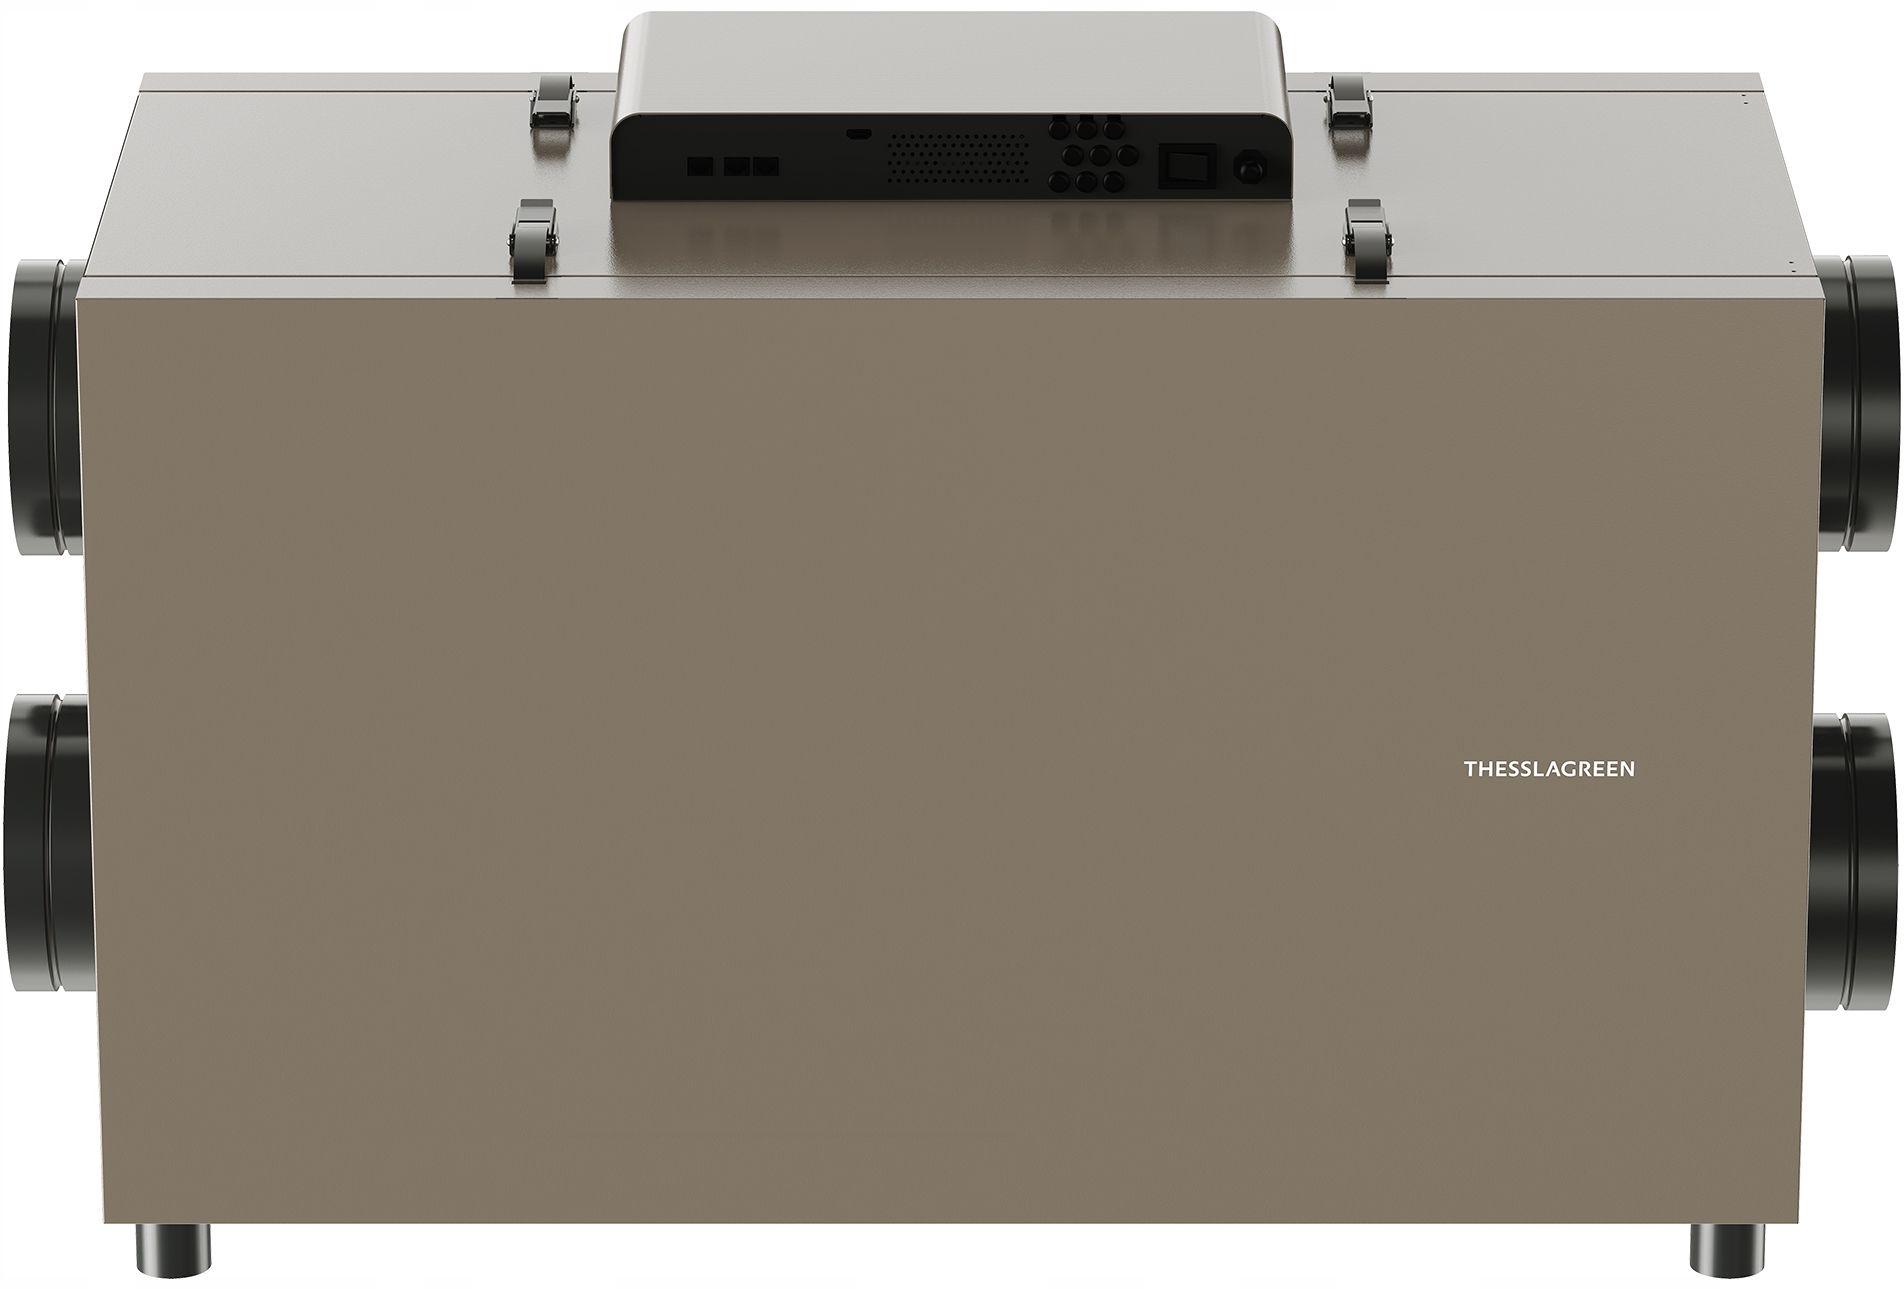 Rekuperator Thessla AirPack Home 300h Energy Centrala rekuperacyjne ThesslaGreen Airpack Home 300H Energy